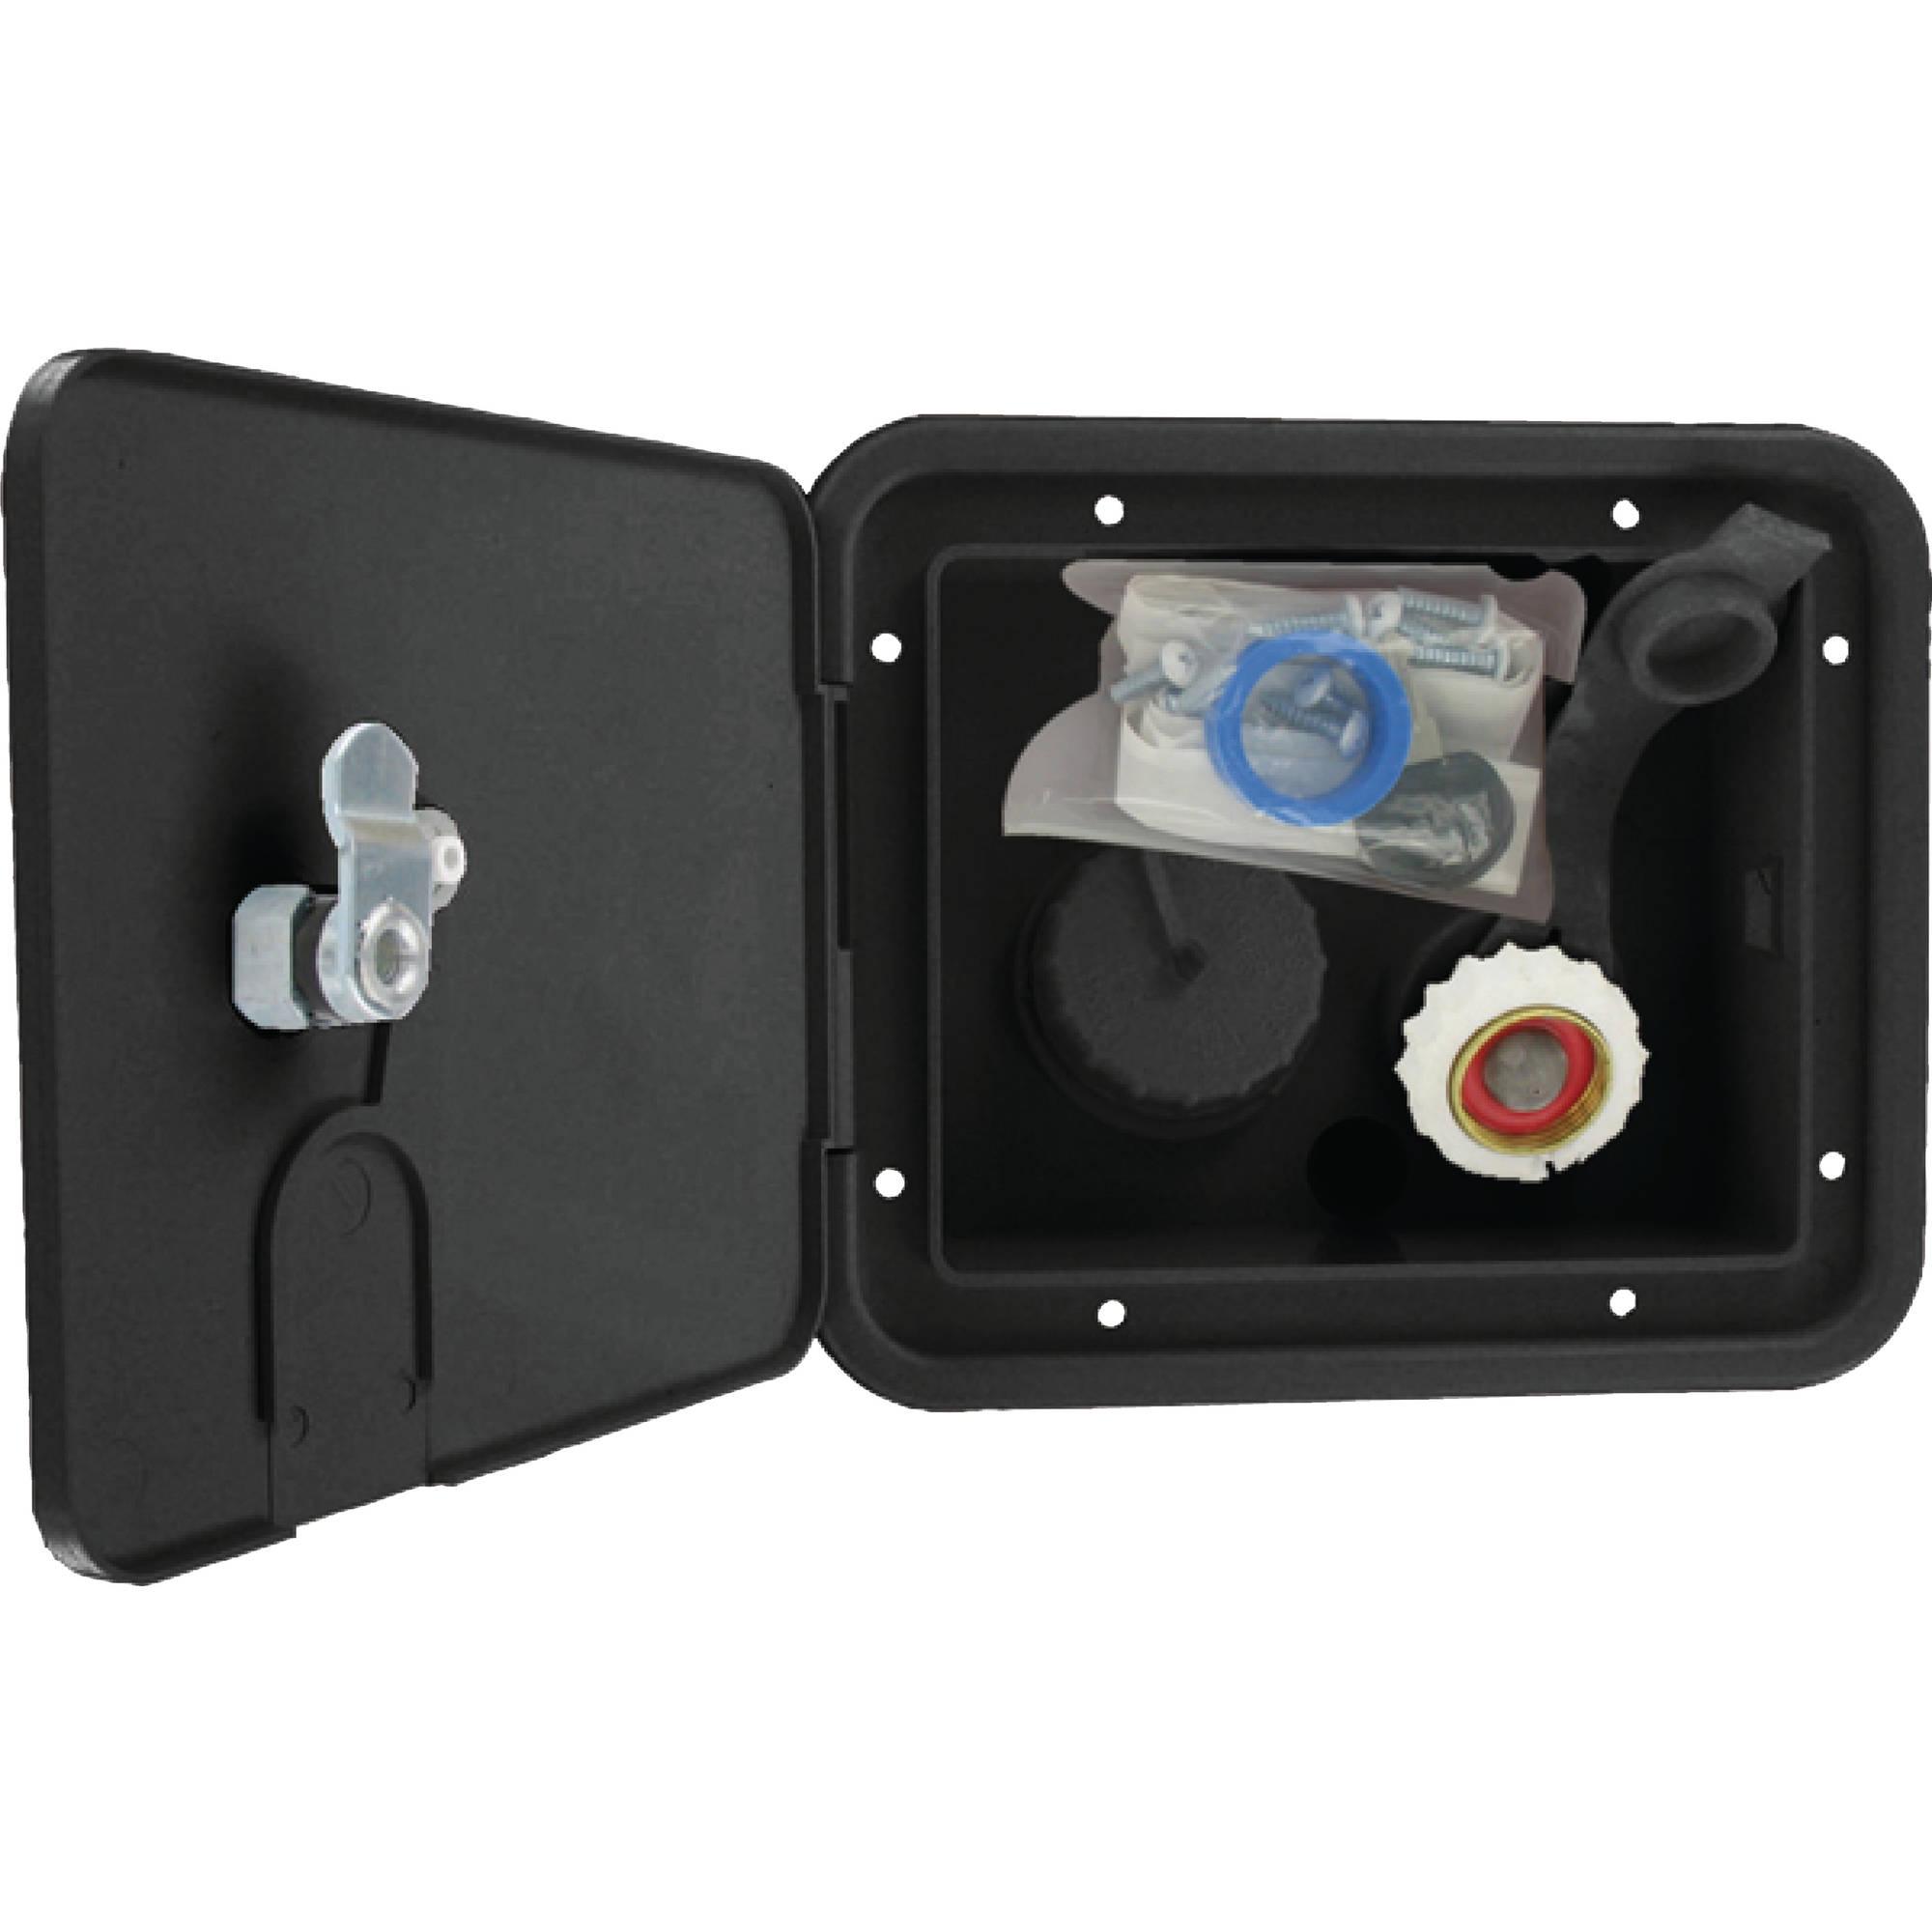 Valterra A01-2000BKVP Gravity/City Water Inlet Hatch - Brass, Black (Carded)